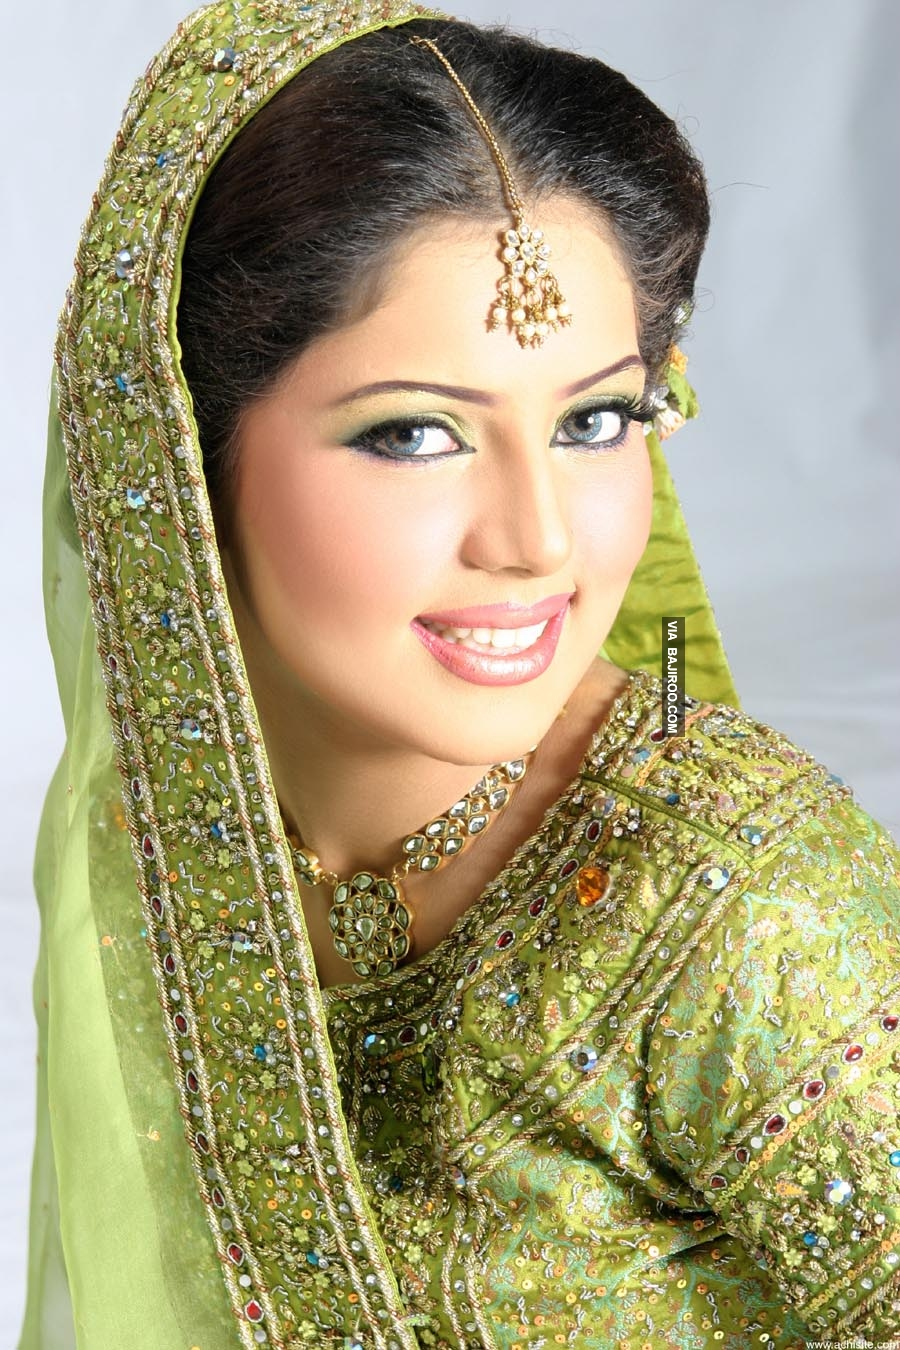 بالصور بنات باكستانيات , اجمل صور بنات باكستان 1857 7